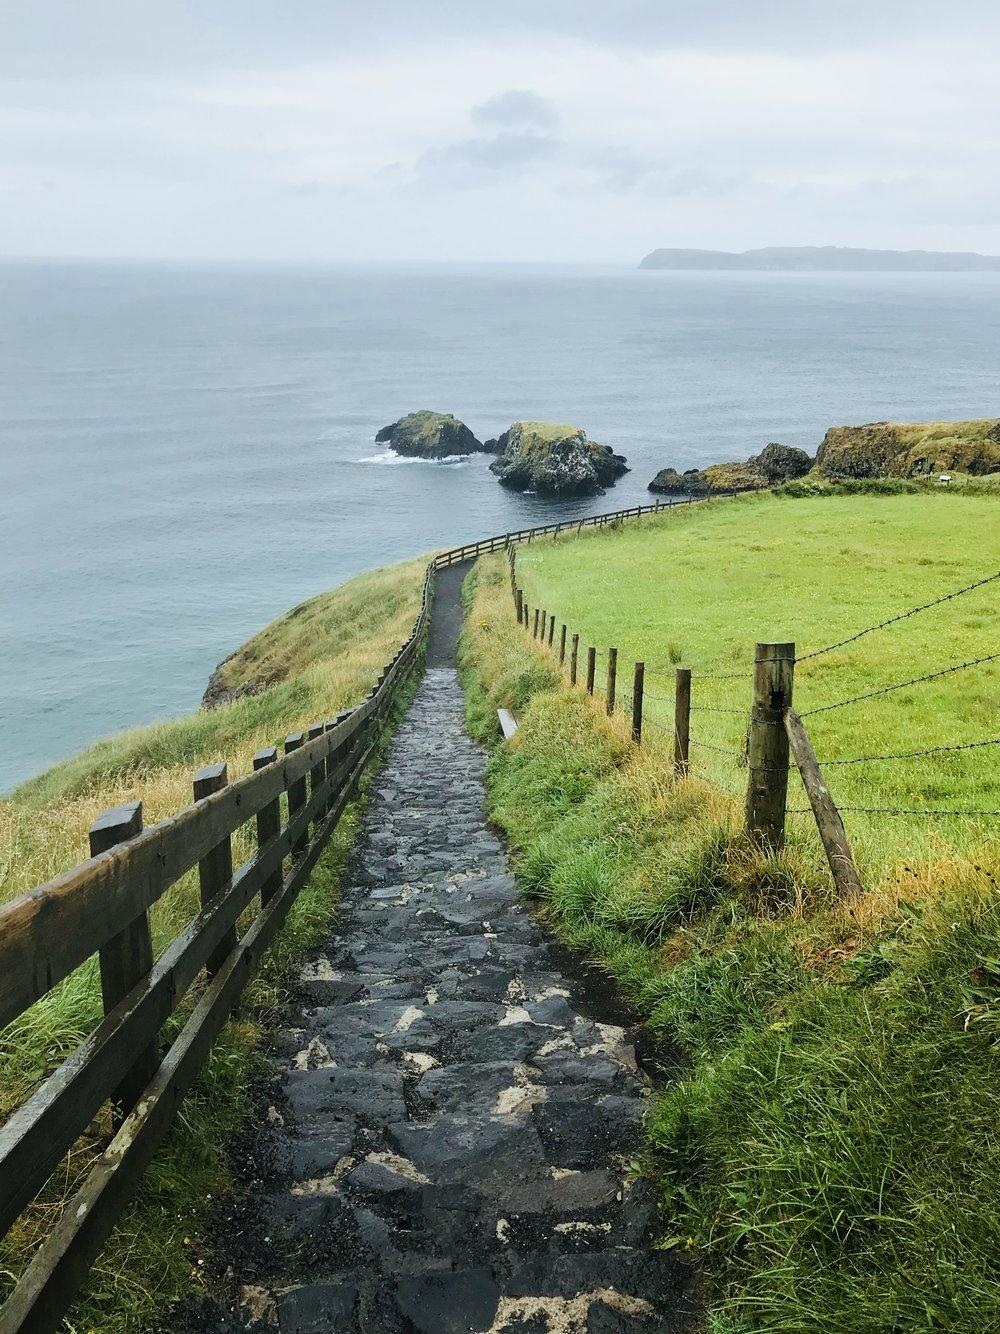 The Walk to Carrick-a-Rede Bridge